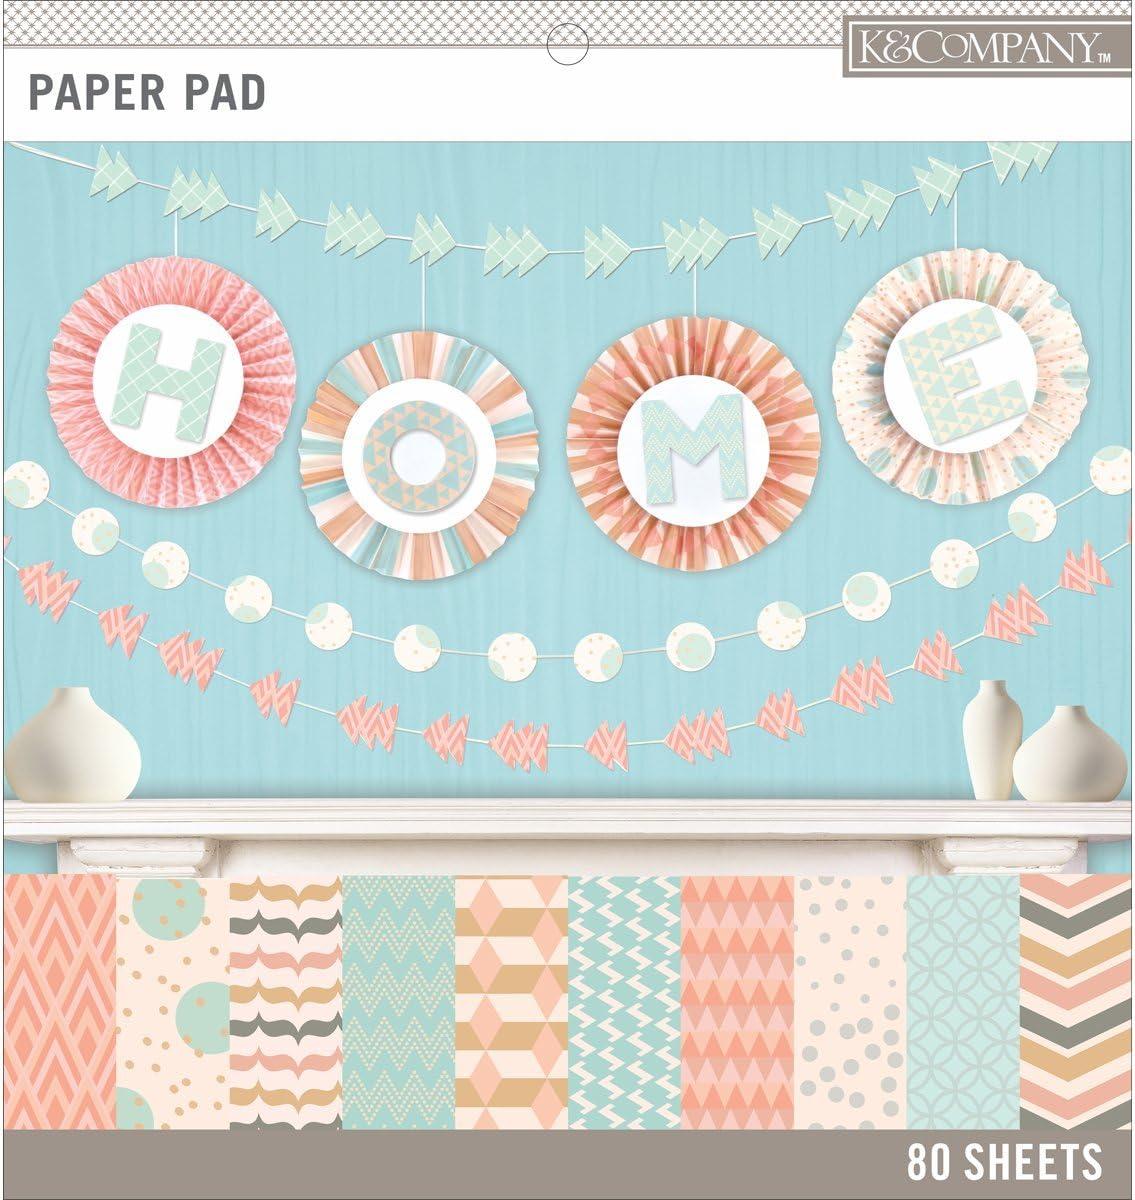 x 12 in Multicolor Pastel Color Basics K/&Company 30-697782 Scrapbook Paper Pad